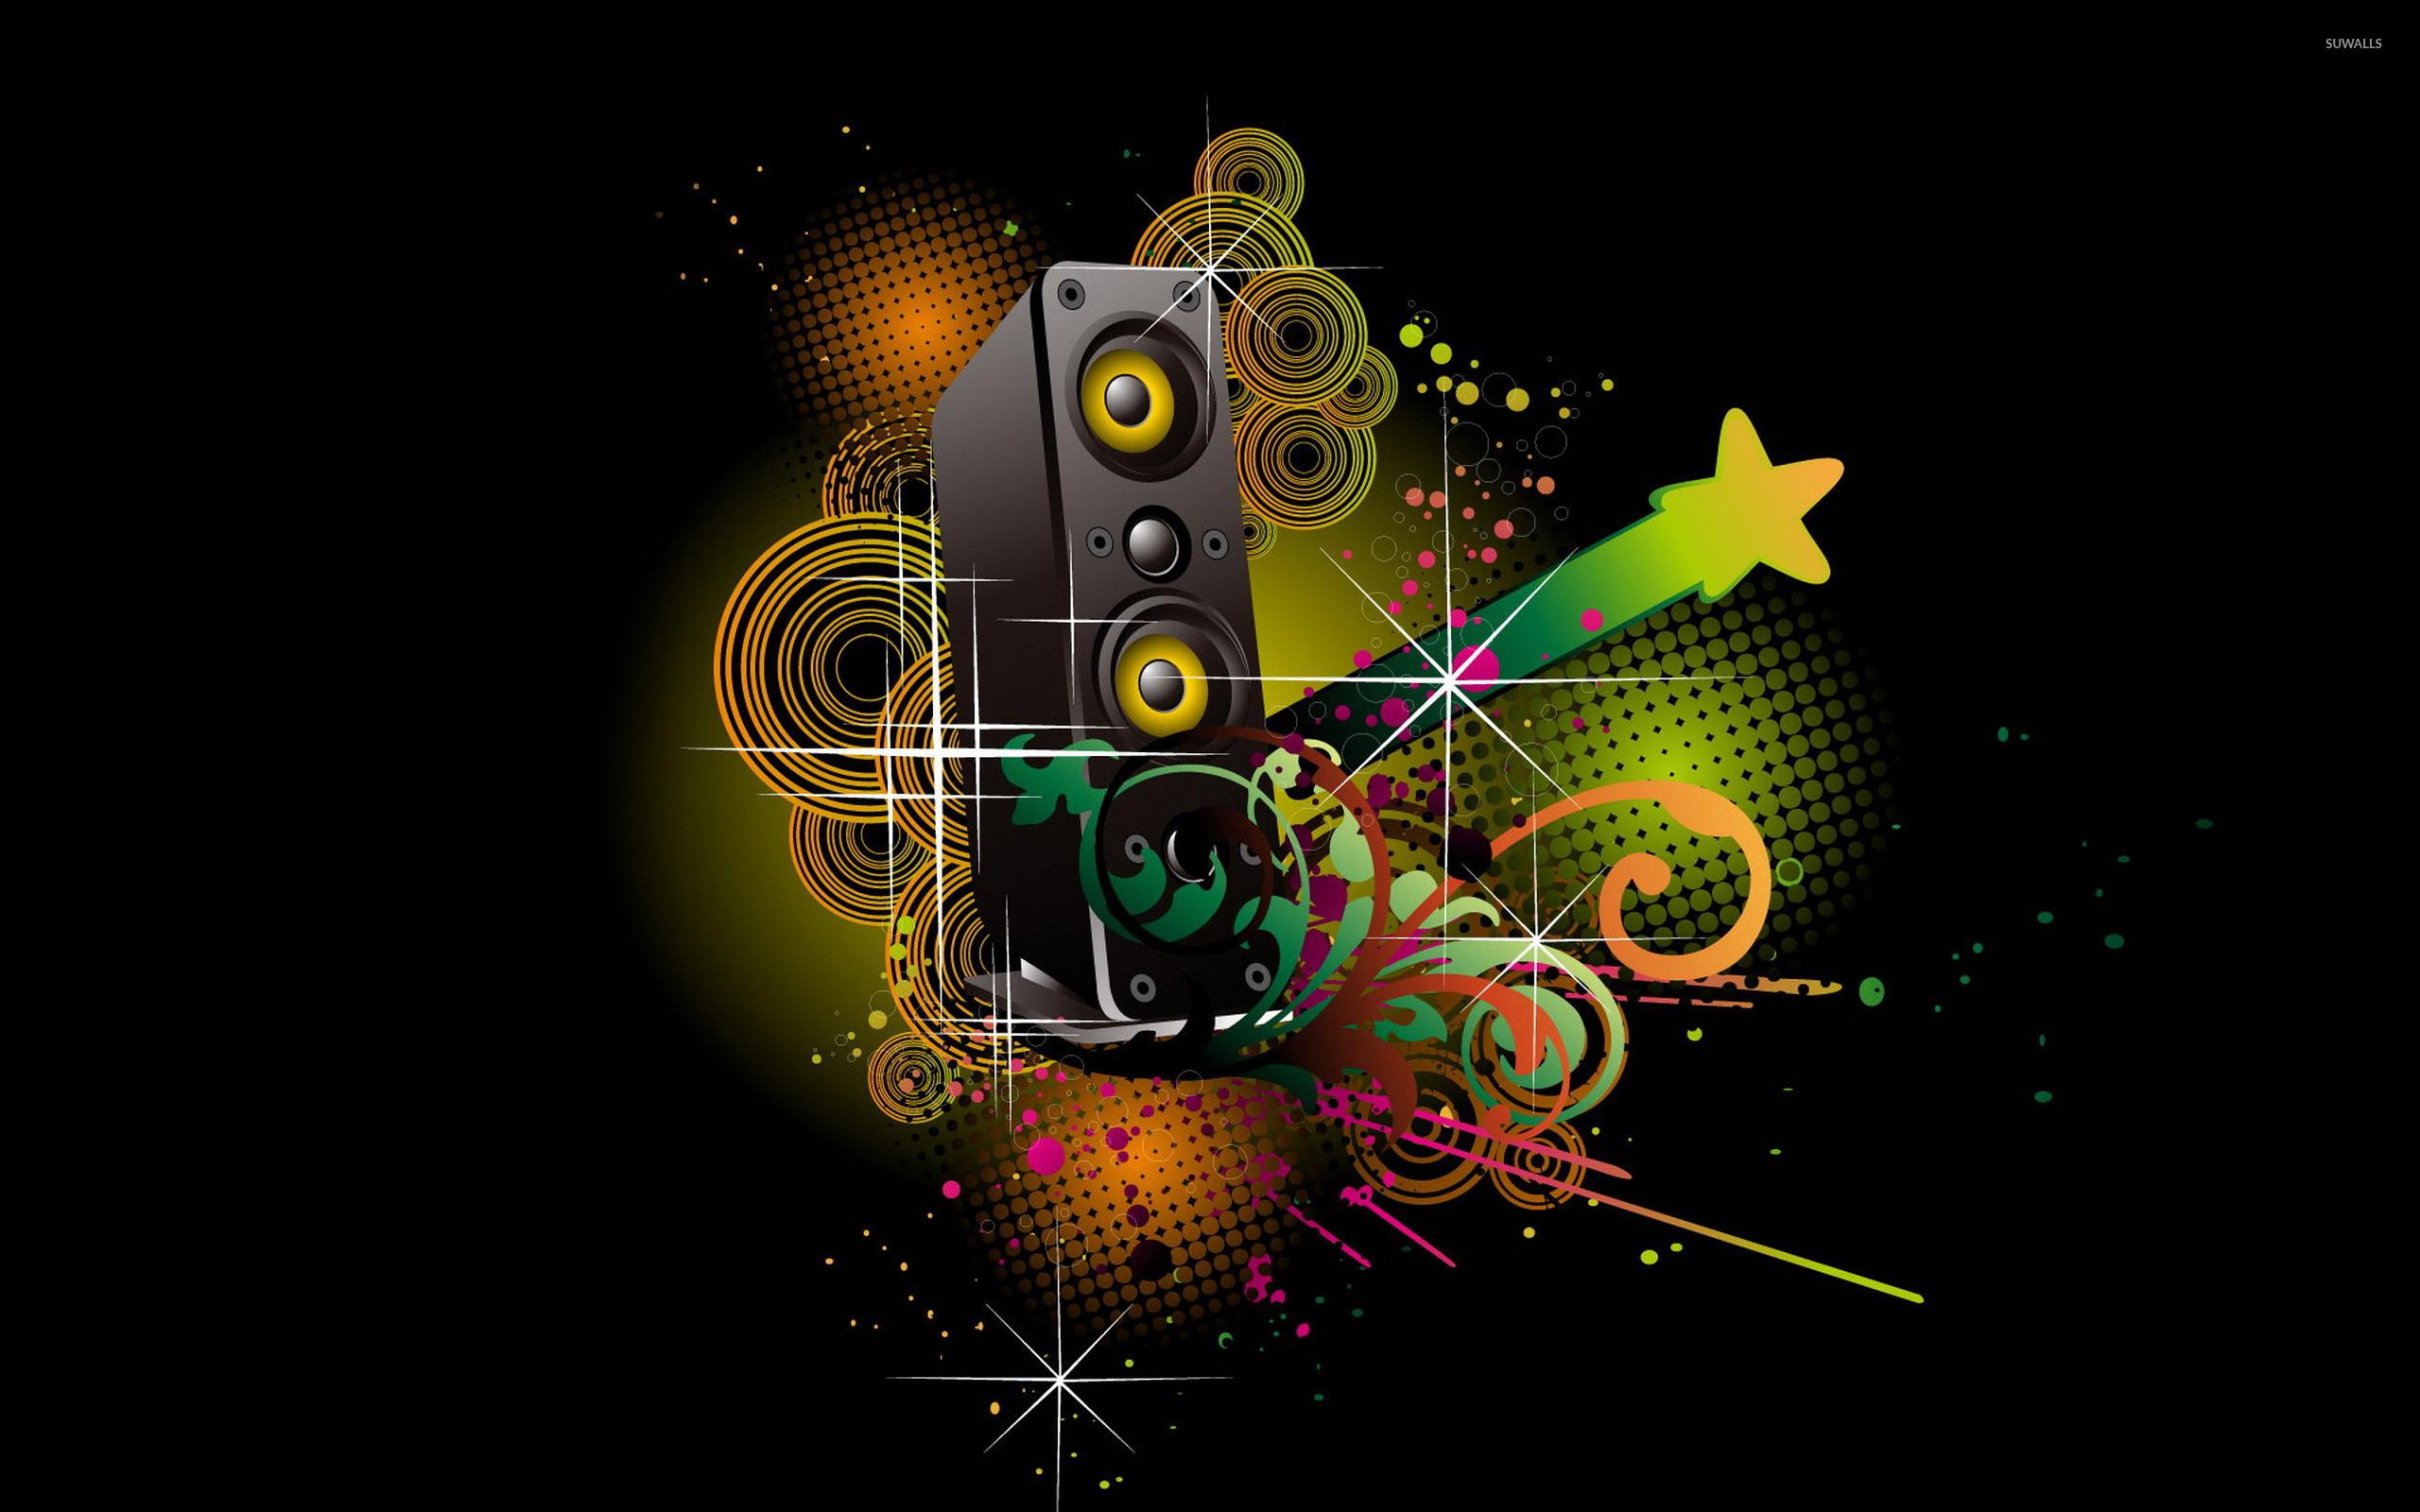 colorful speaker wallpaper music wallpapers 17310